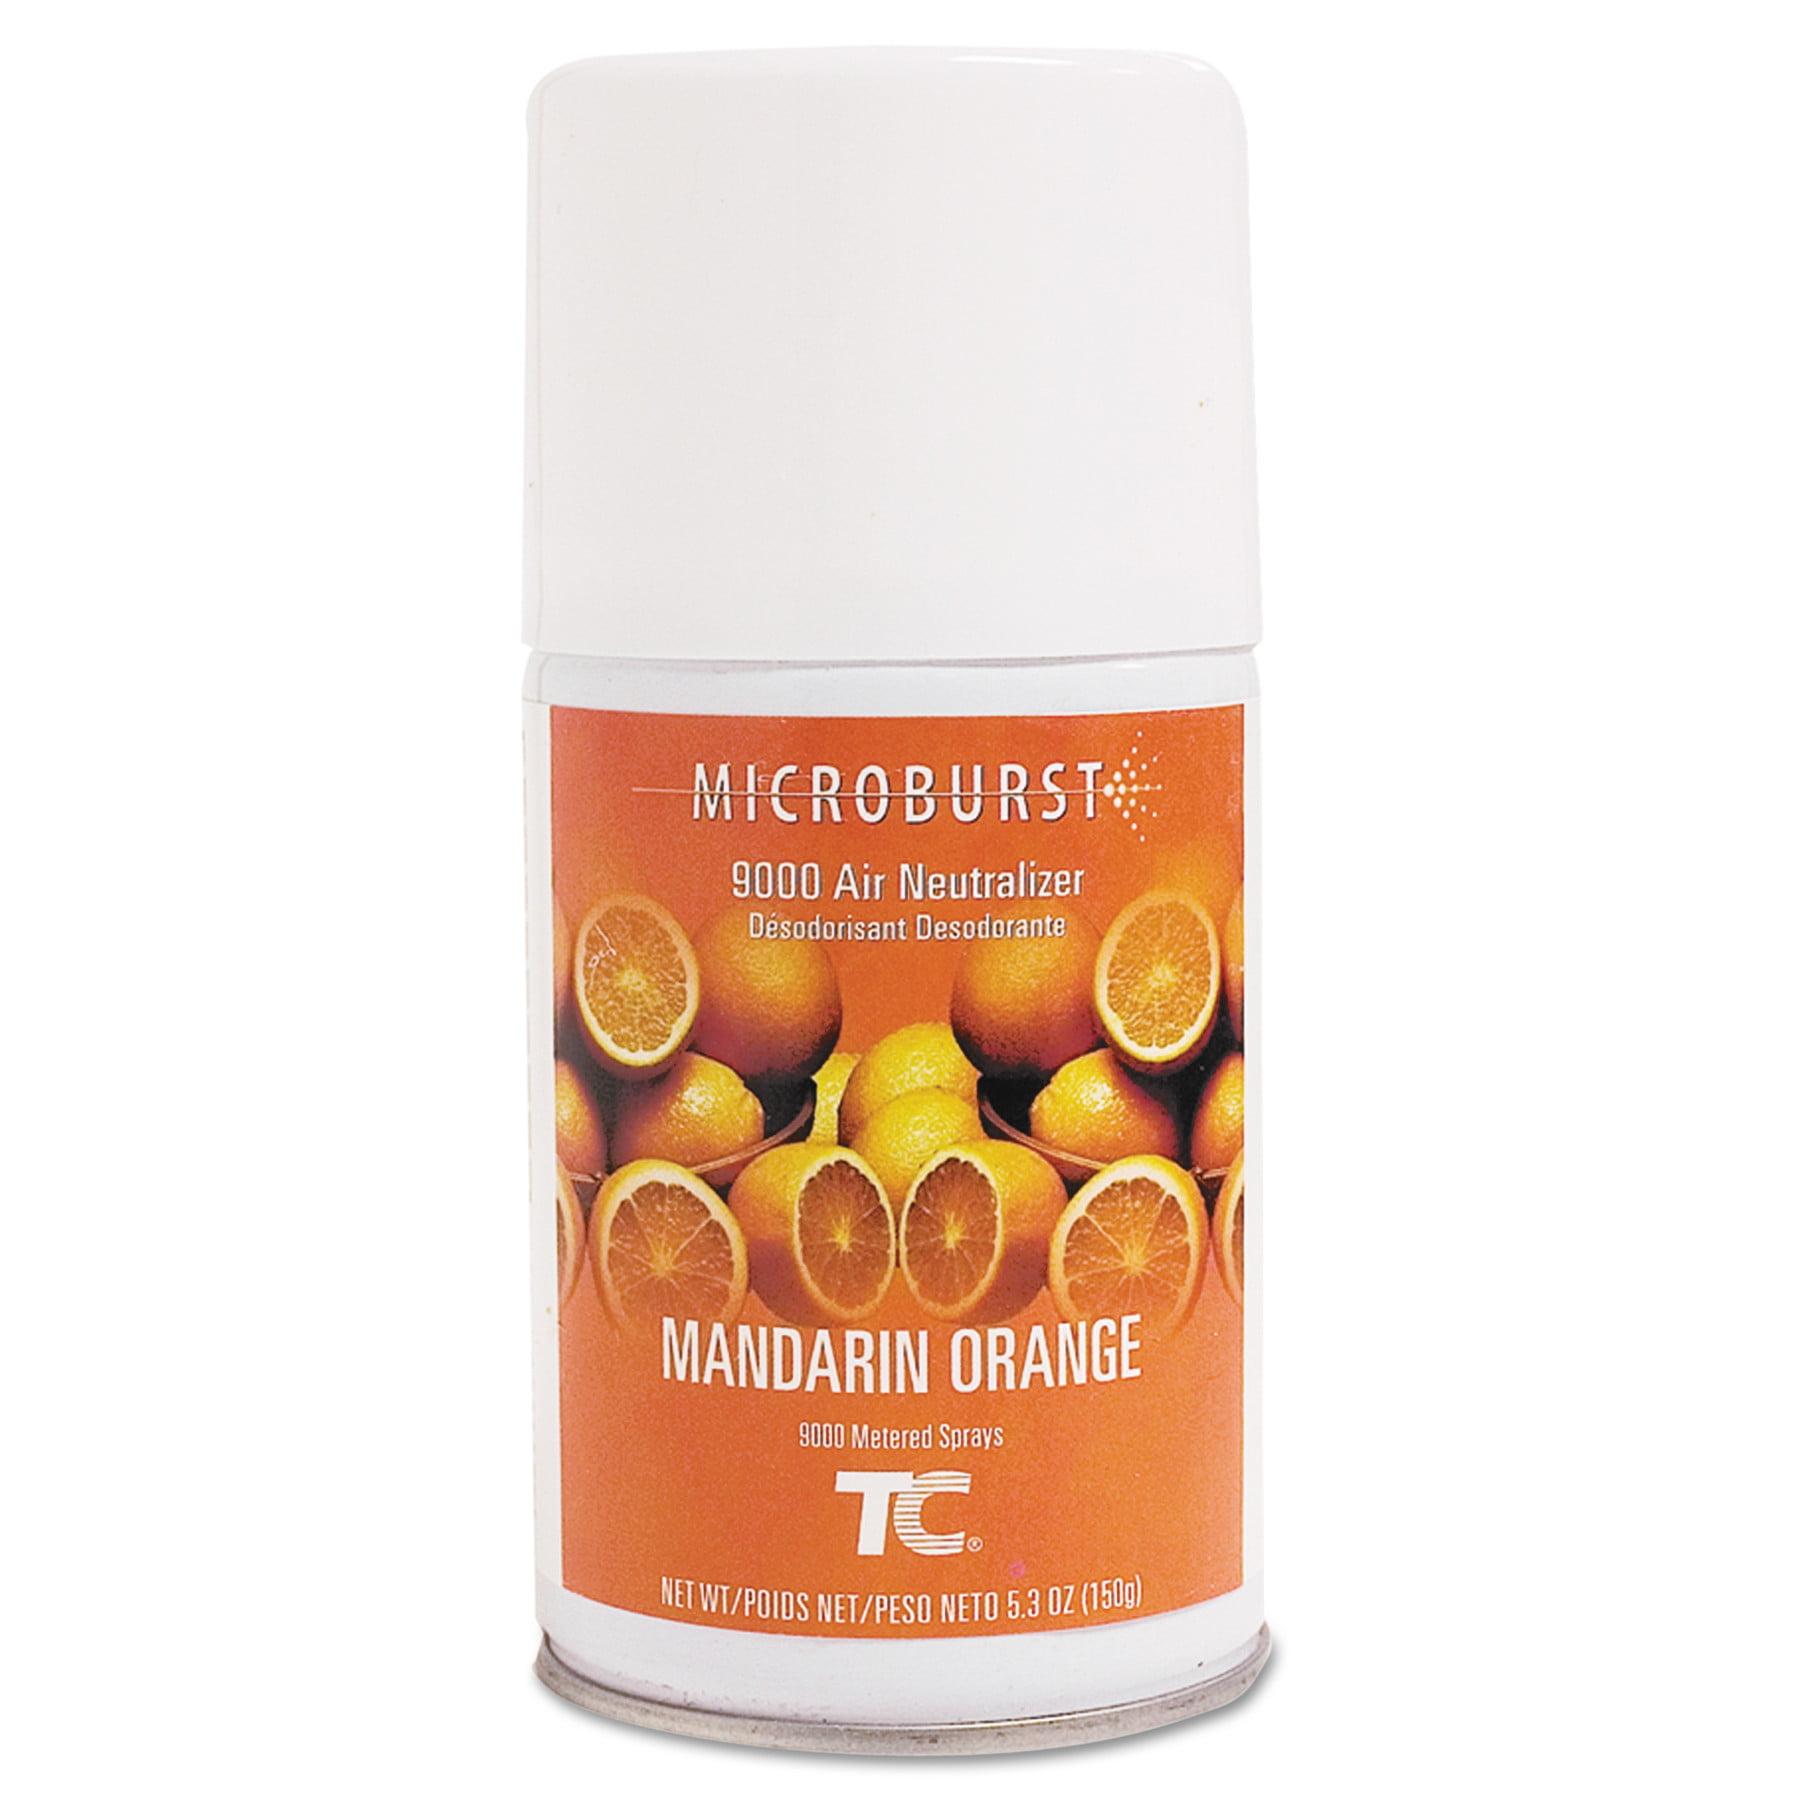 Rubbermaid Commercial Microburst 9000 Mandarin Orange Air Freshener Refills, 5.3 oz, 4 count